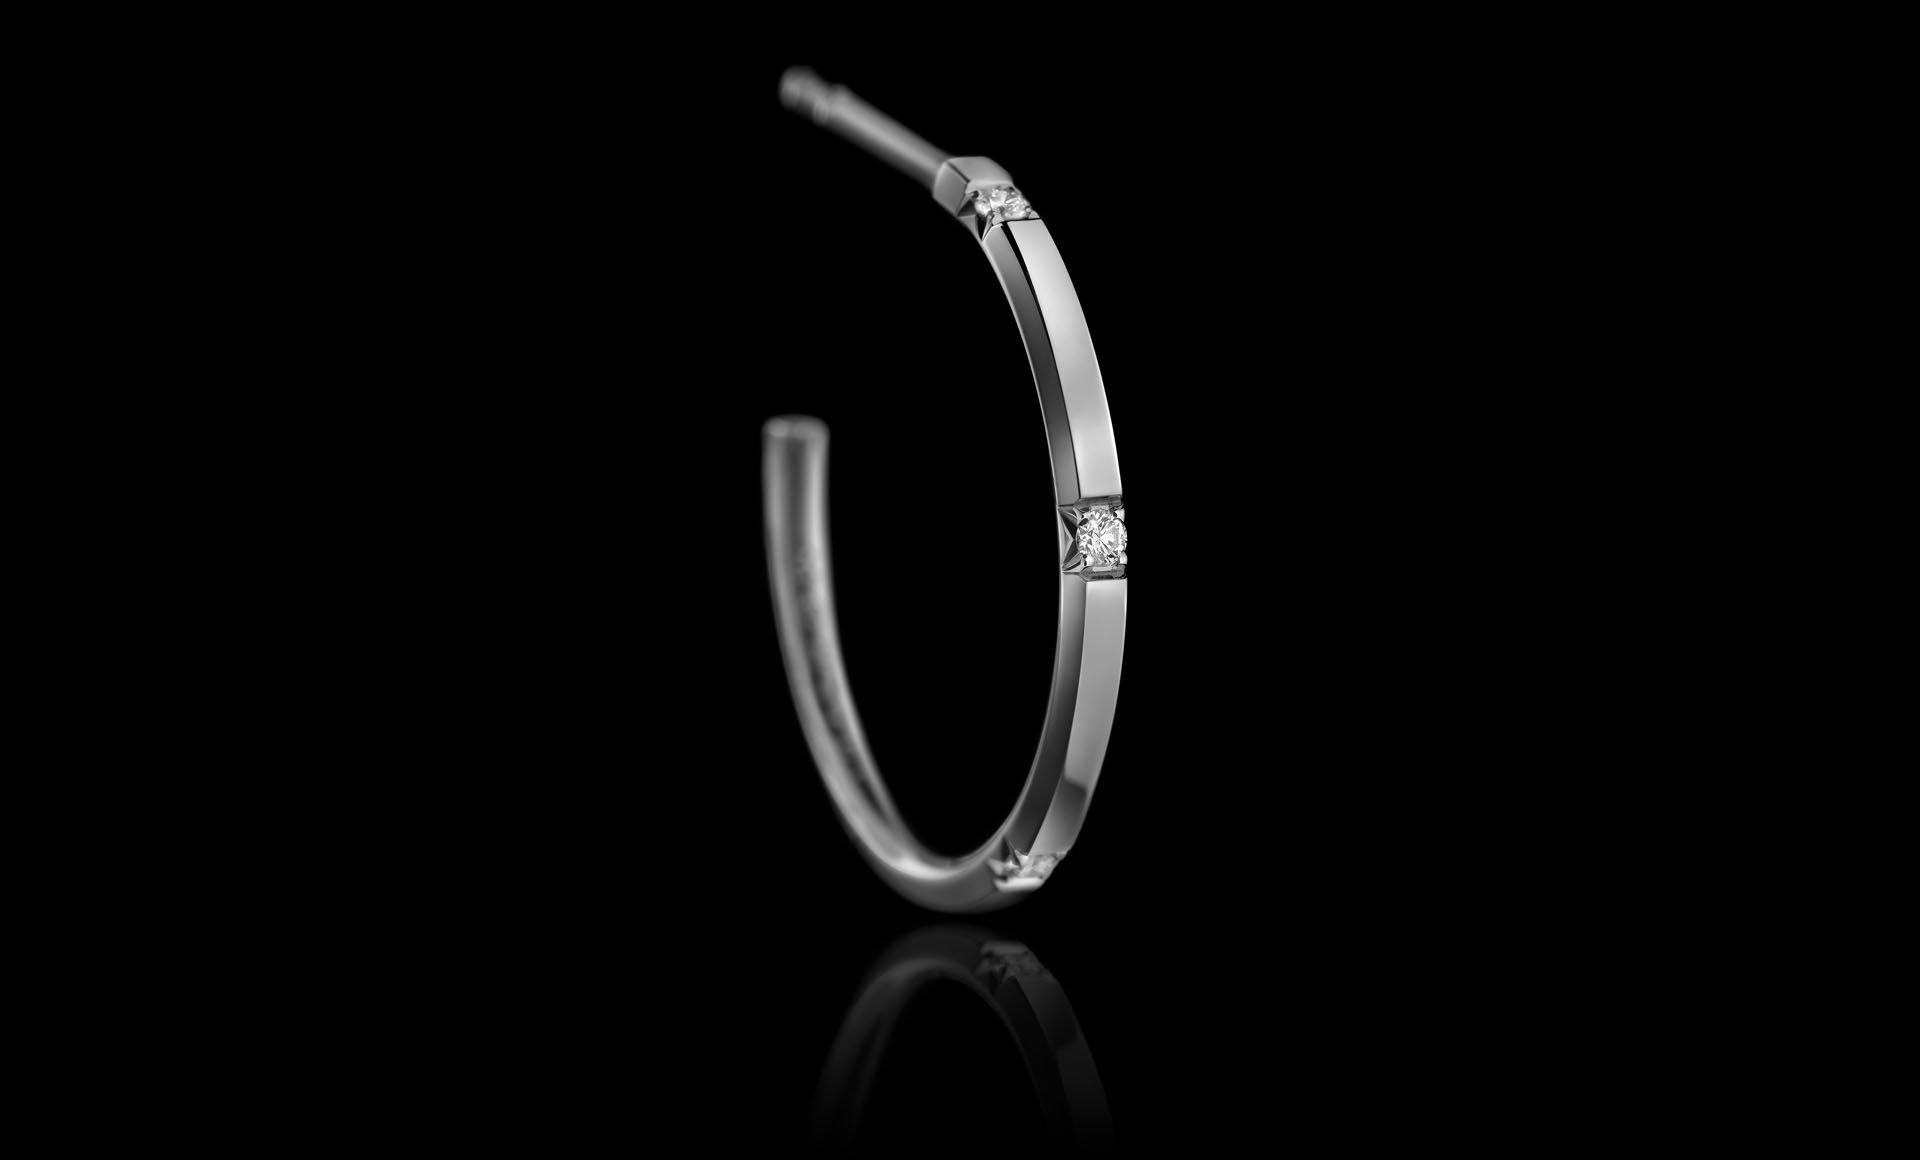 Montluc - Halo No 4. Diamond hoop earrings, each one set with 5 perfect, round cut diamonds.